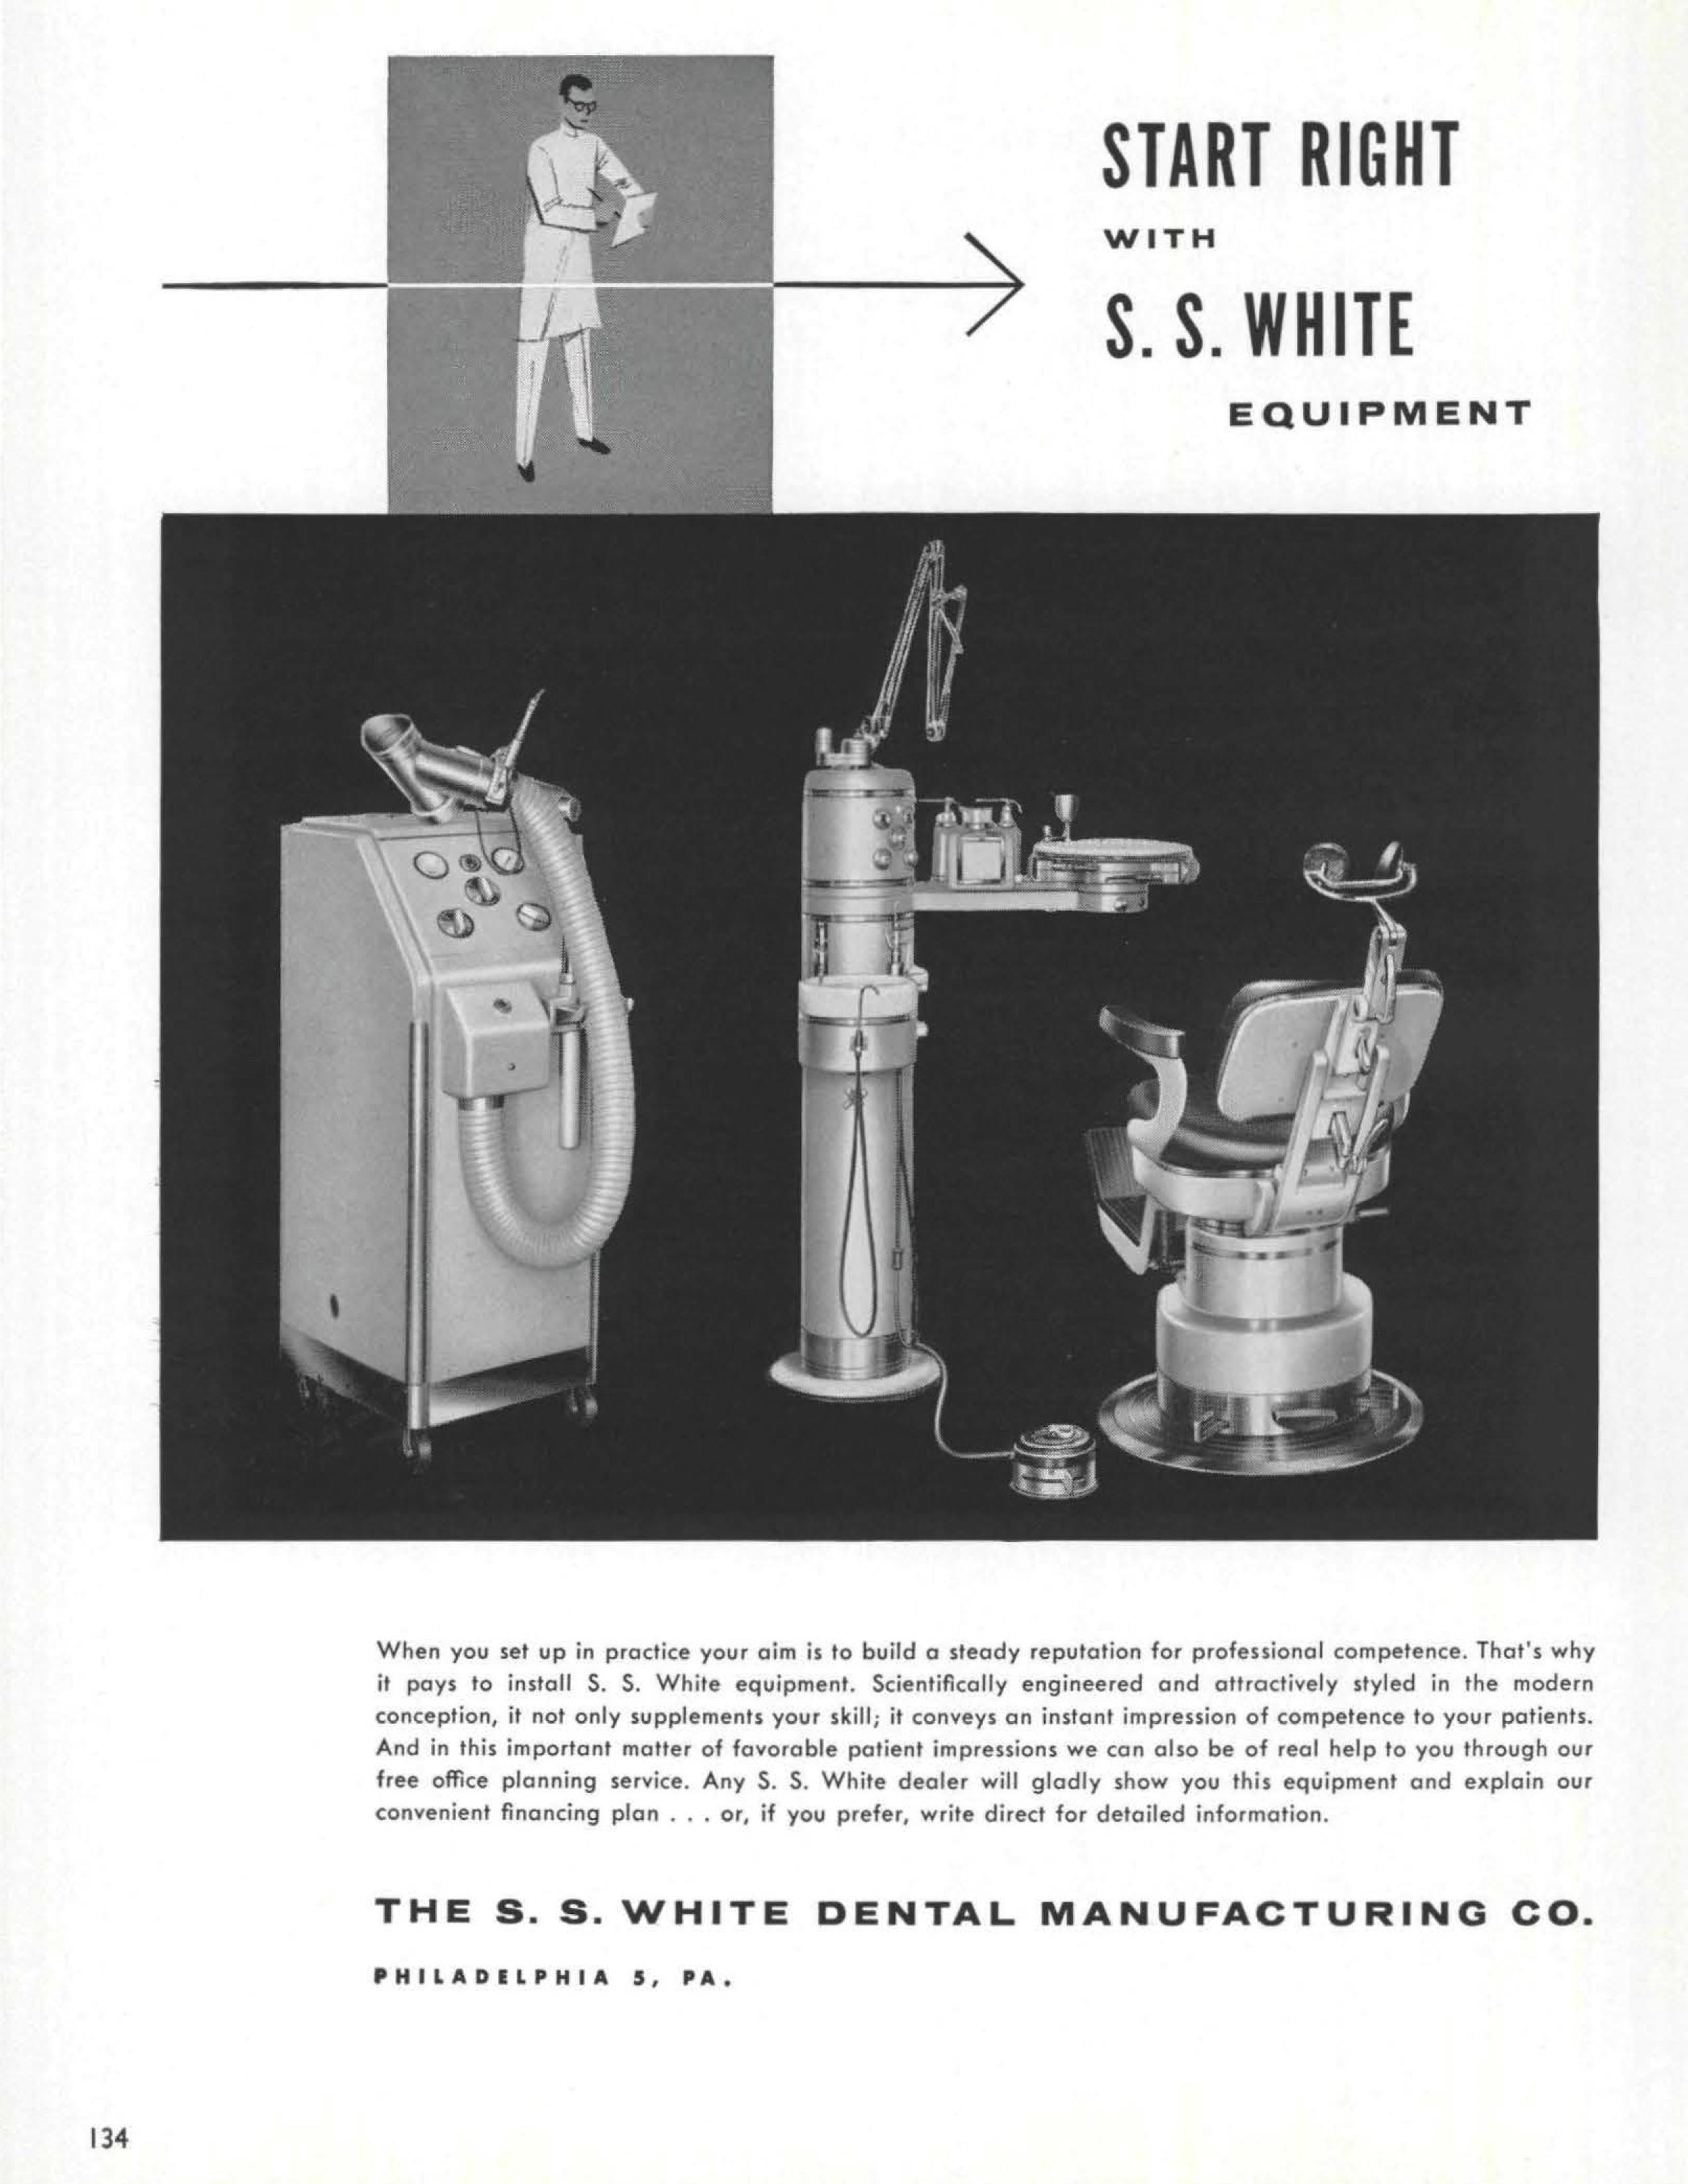 1955 Ad